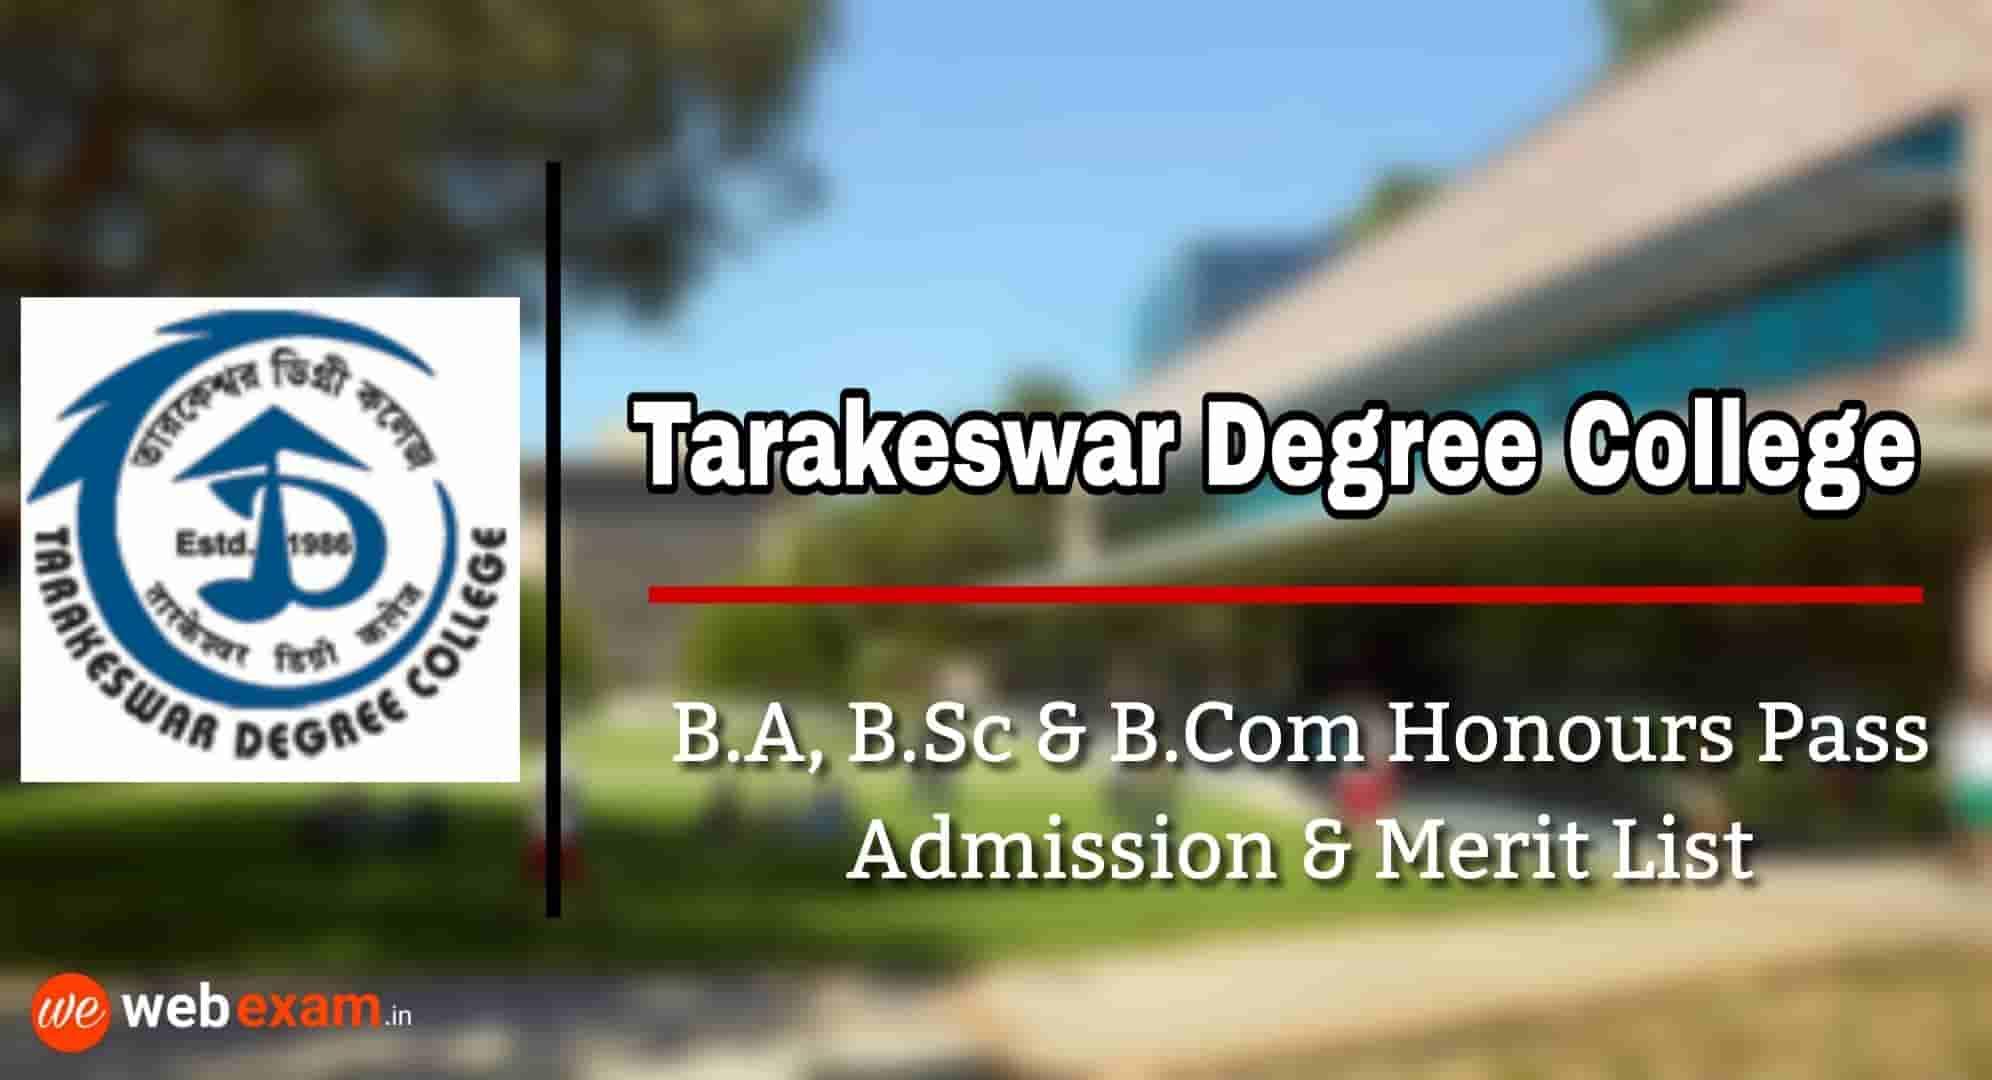 Tarakeswar Degree College Admission